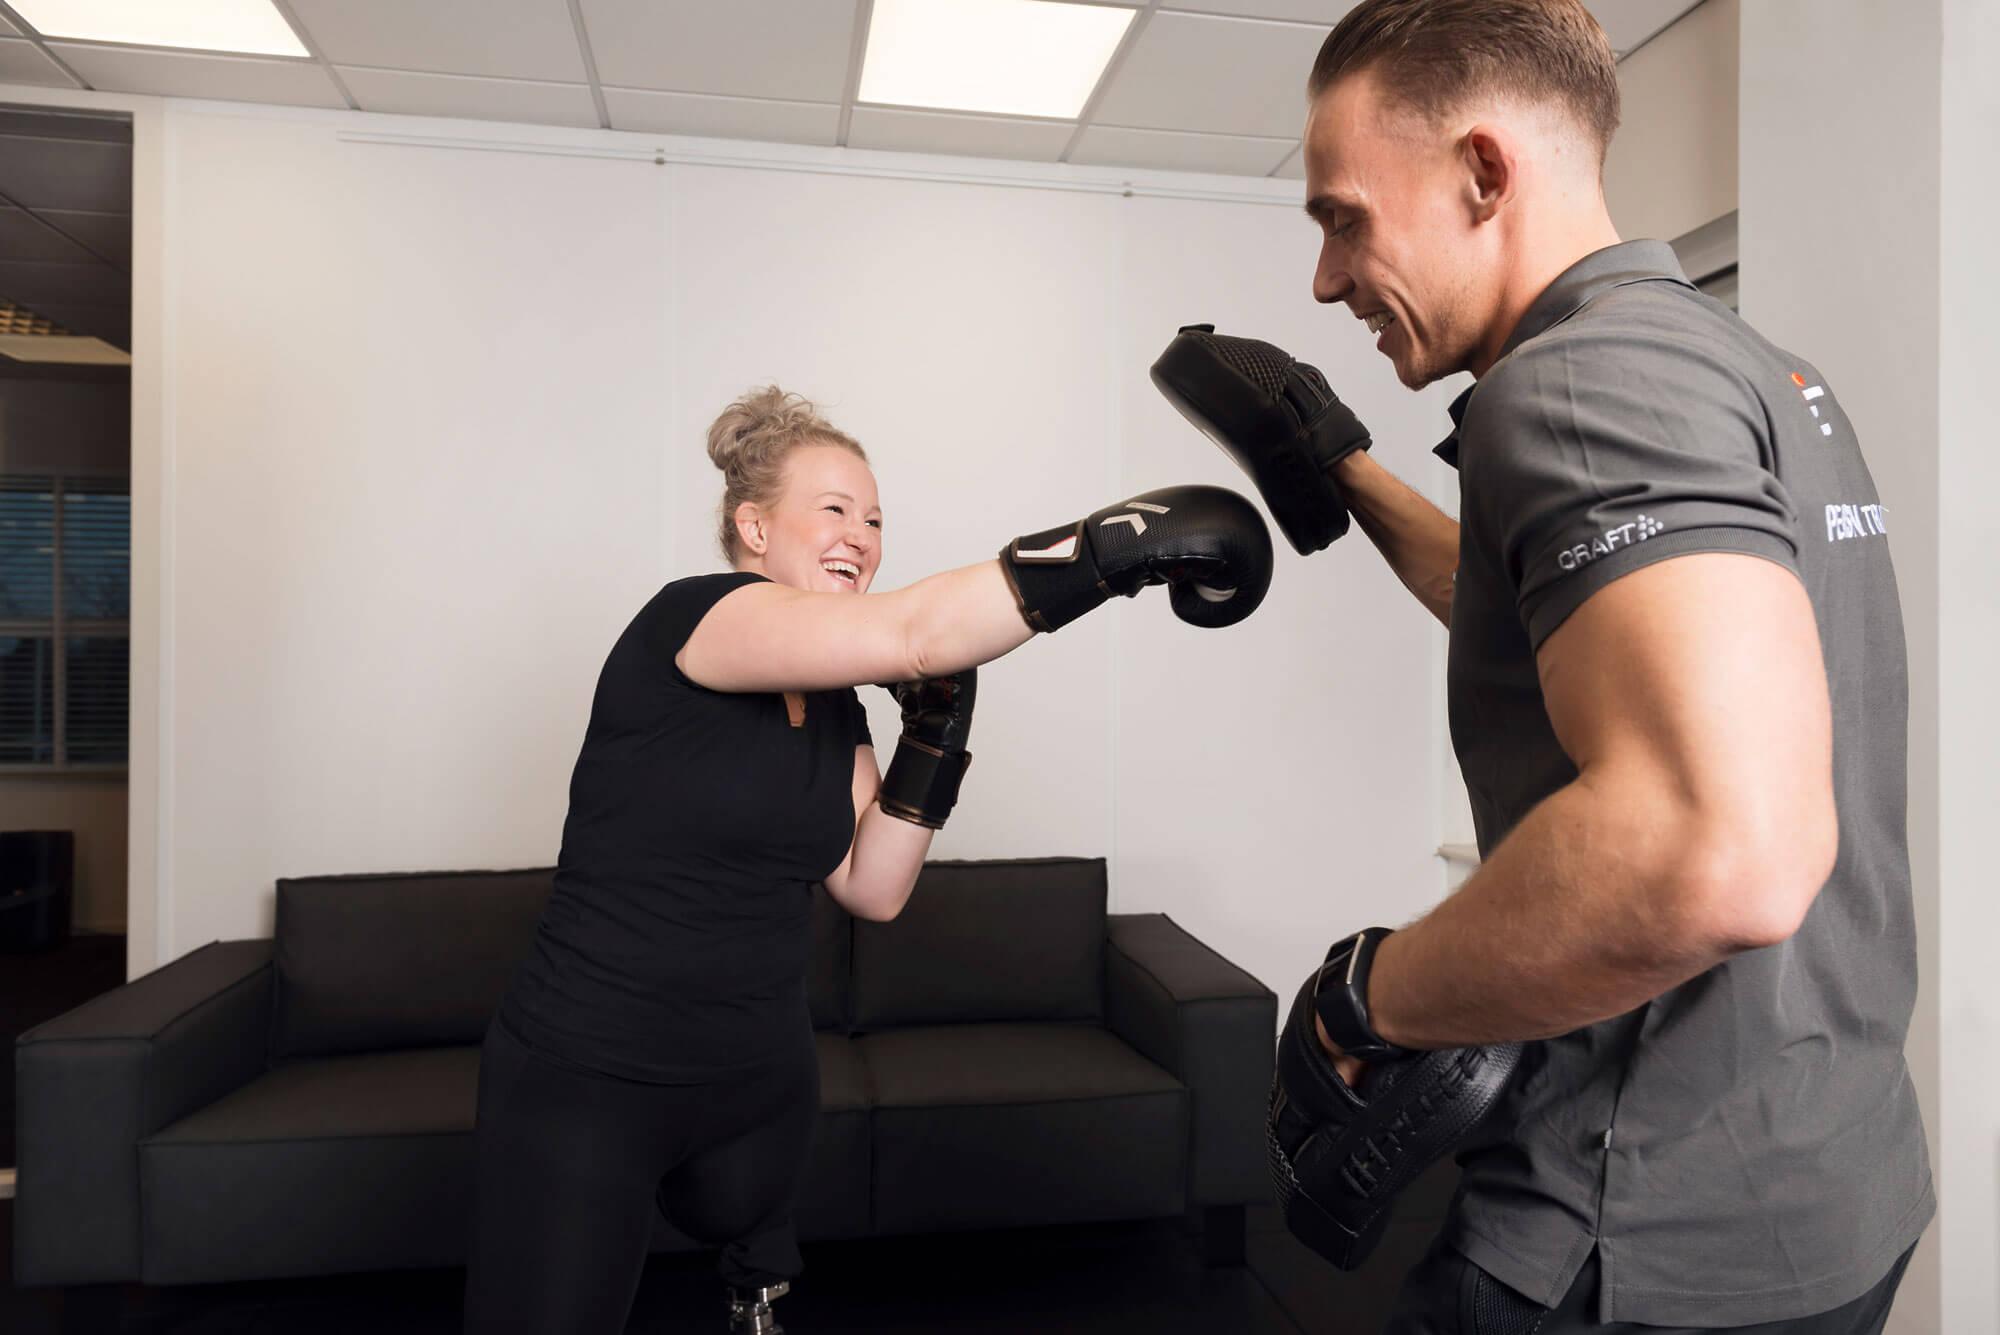 Boxen personal trainer